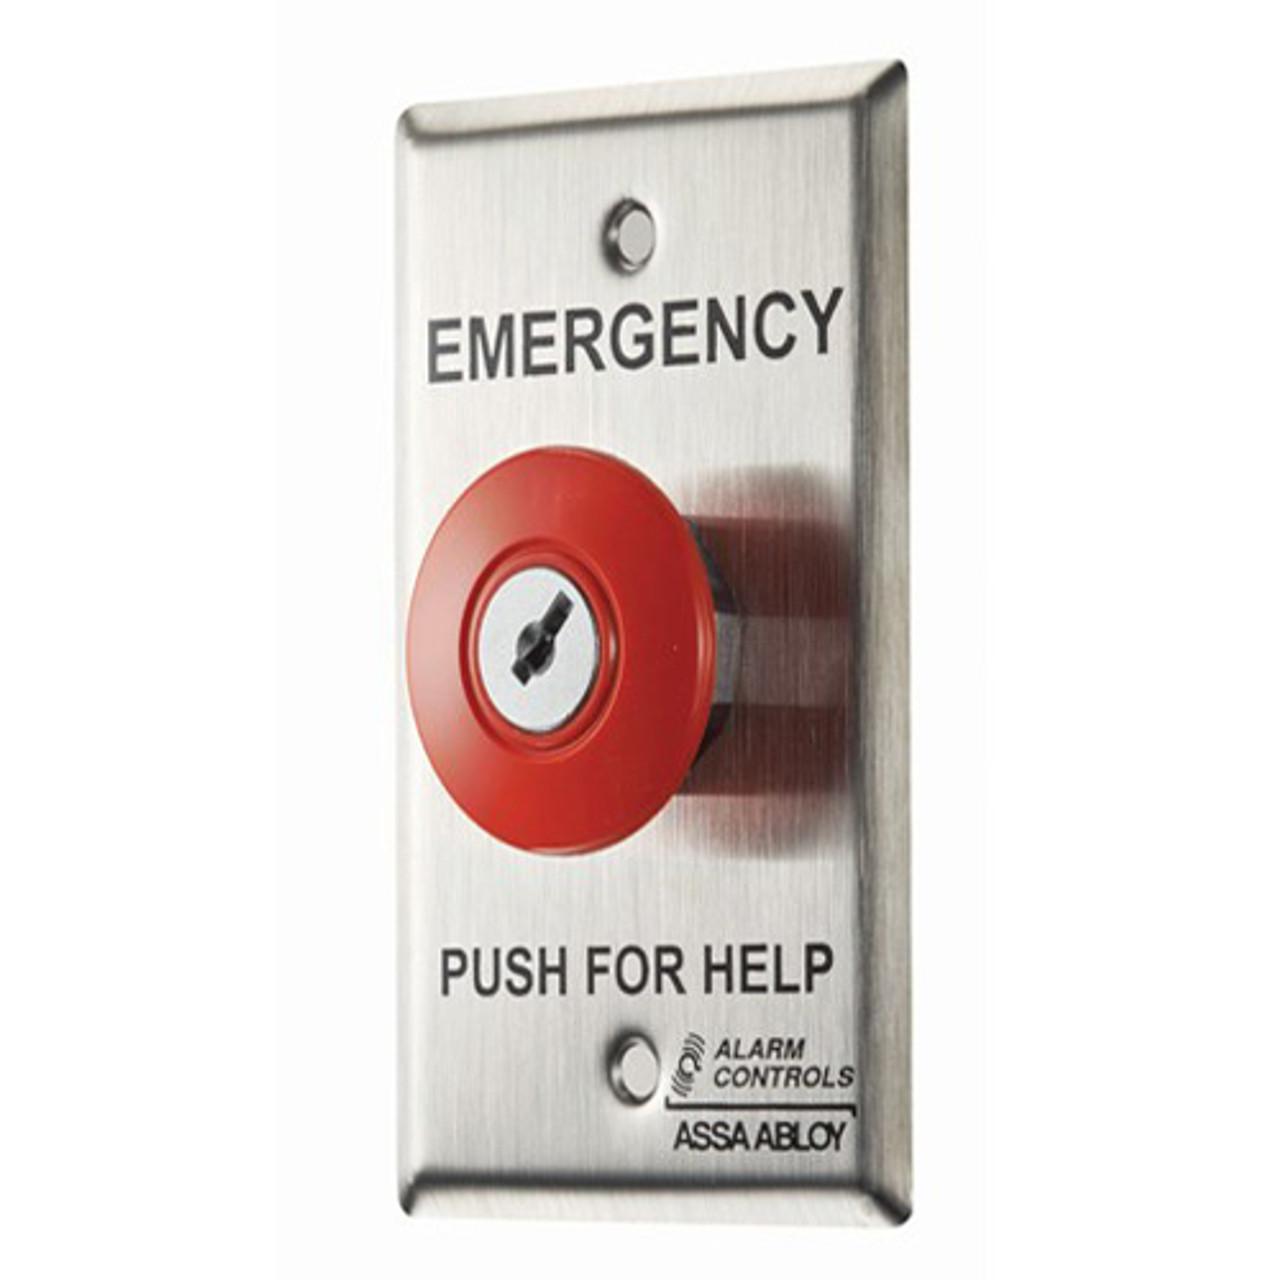 ASP-KR-1 ASP Alarm Control Latching Key Reset Panic Stations